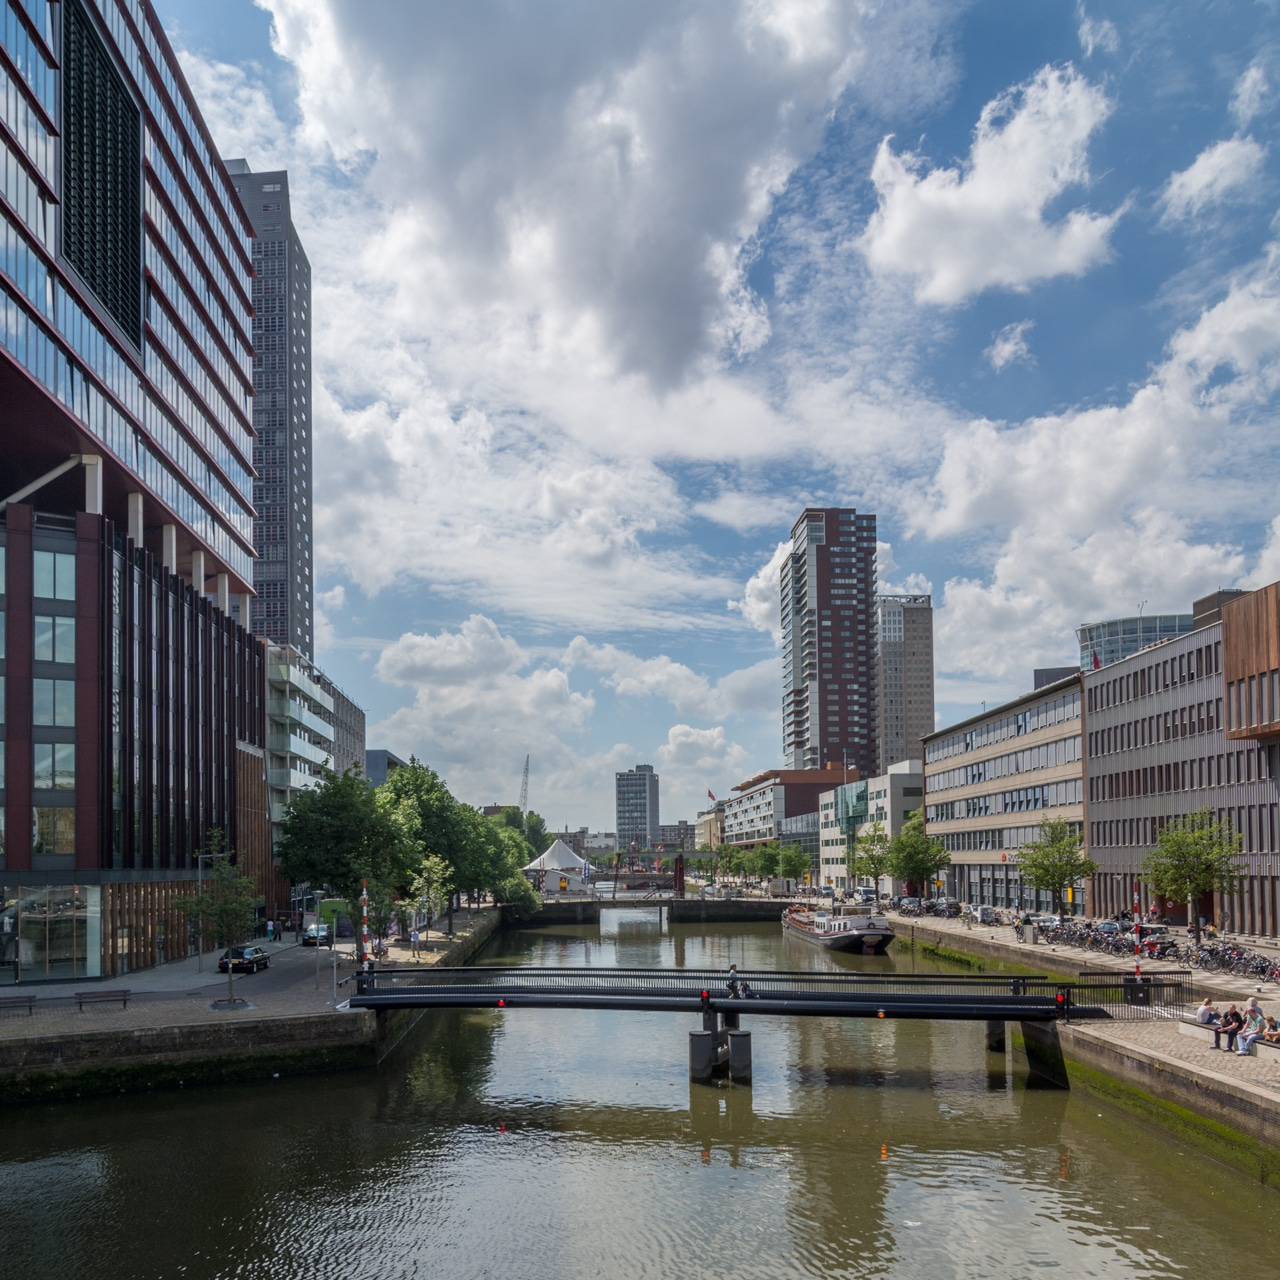 Роттердам - пешеходный мост Роттердам Роттердам (Rotterdam), Нидерланды Rotterdam pedestrian bridge